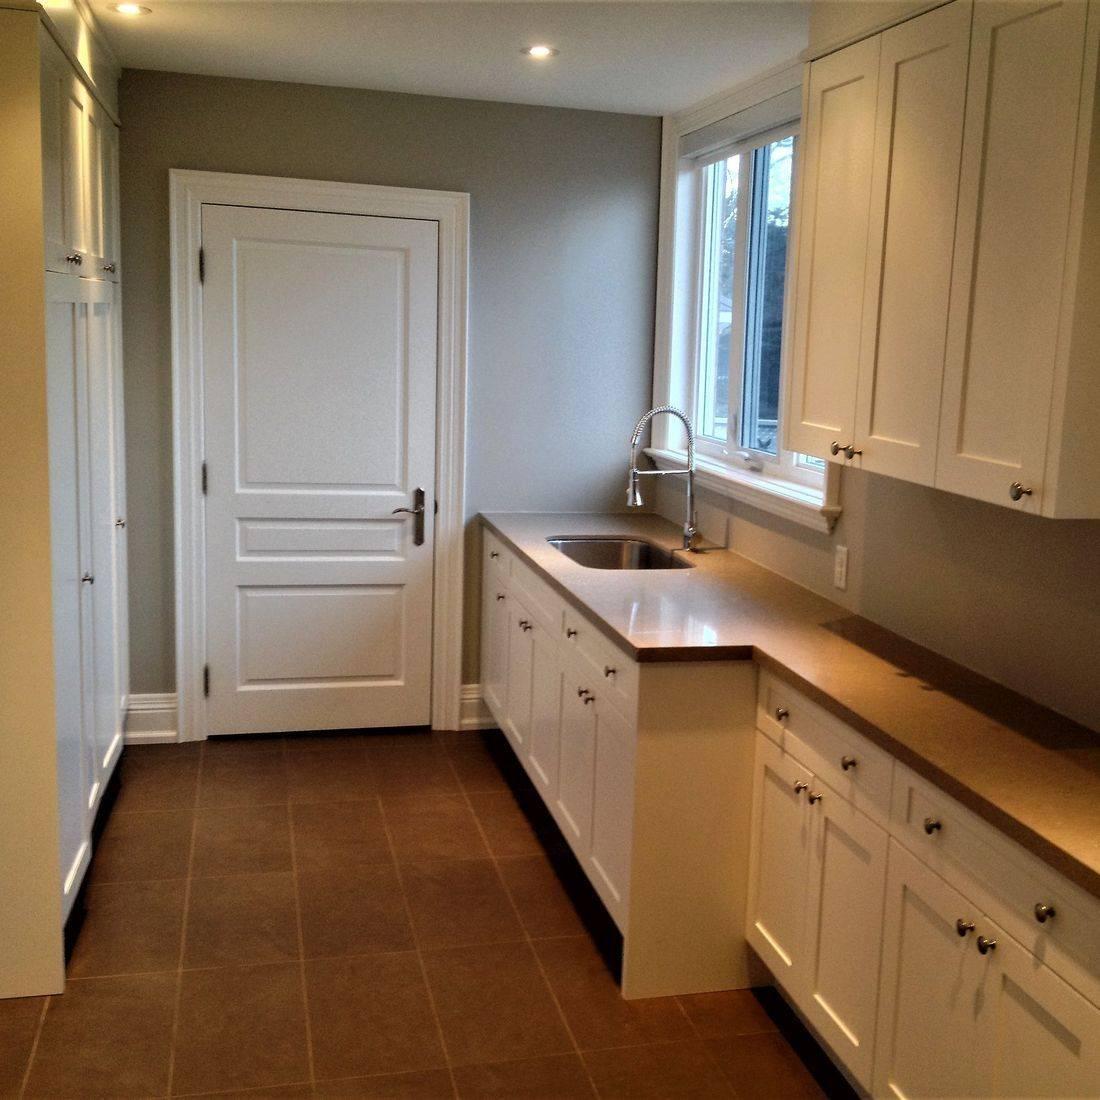 Sibra Kitchens Markham Toronto cabinets laundry room